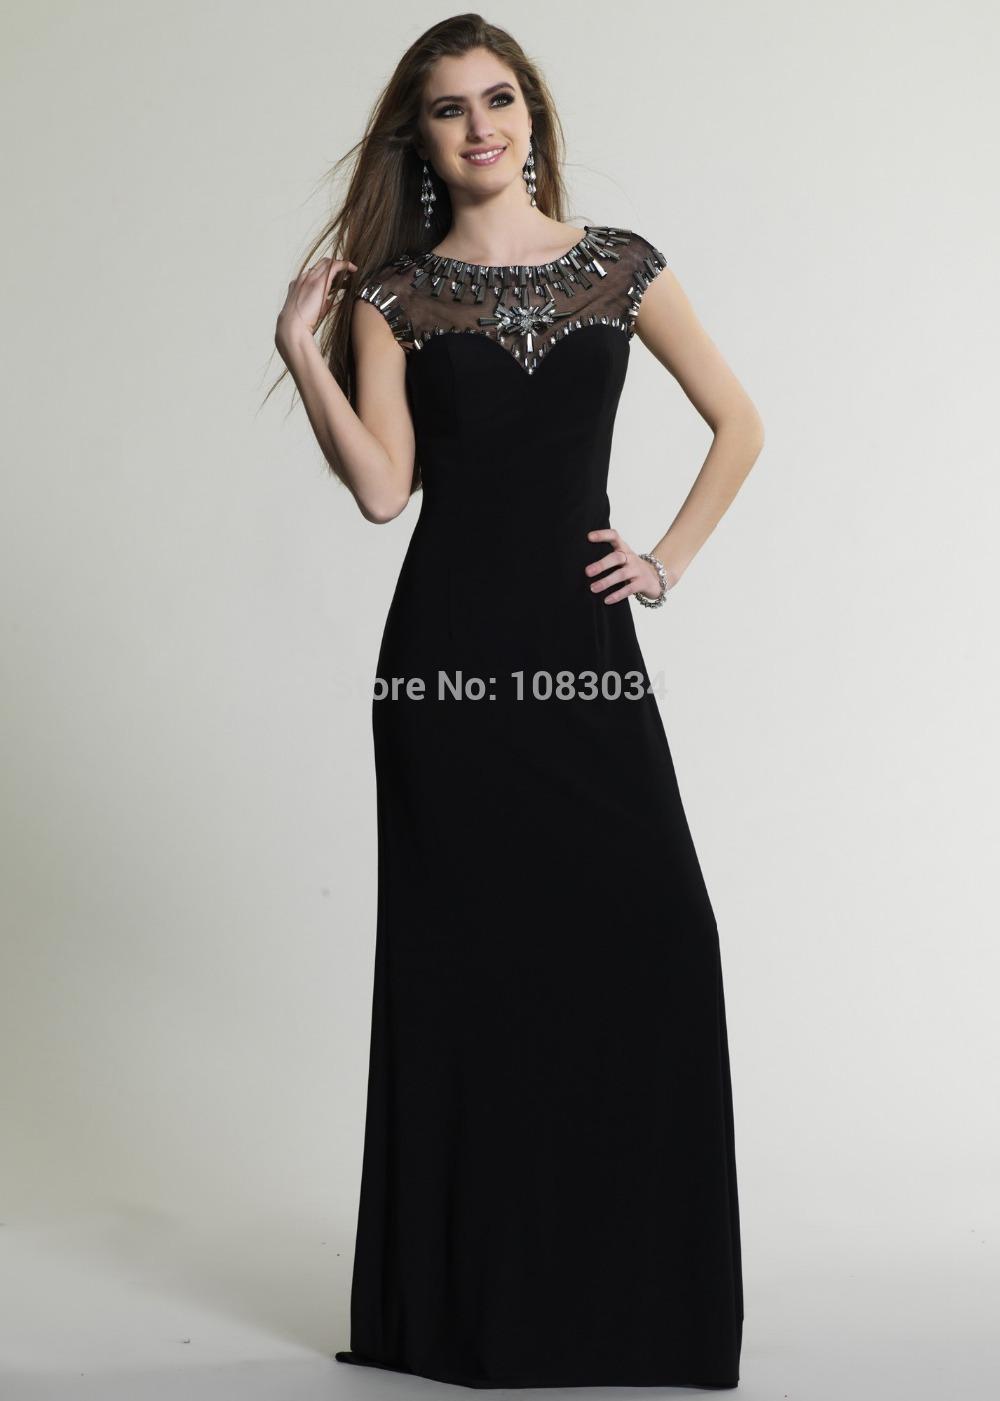 Long Evening Dresses Petite Sizes - Plus Size Masquerade Dresses